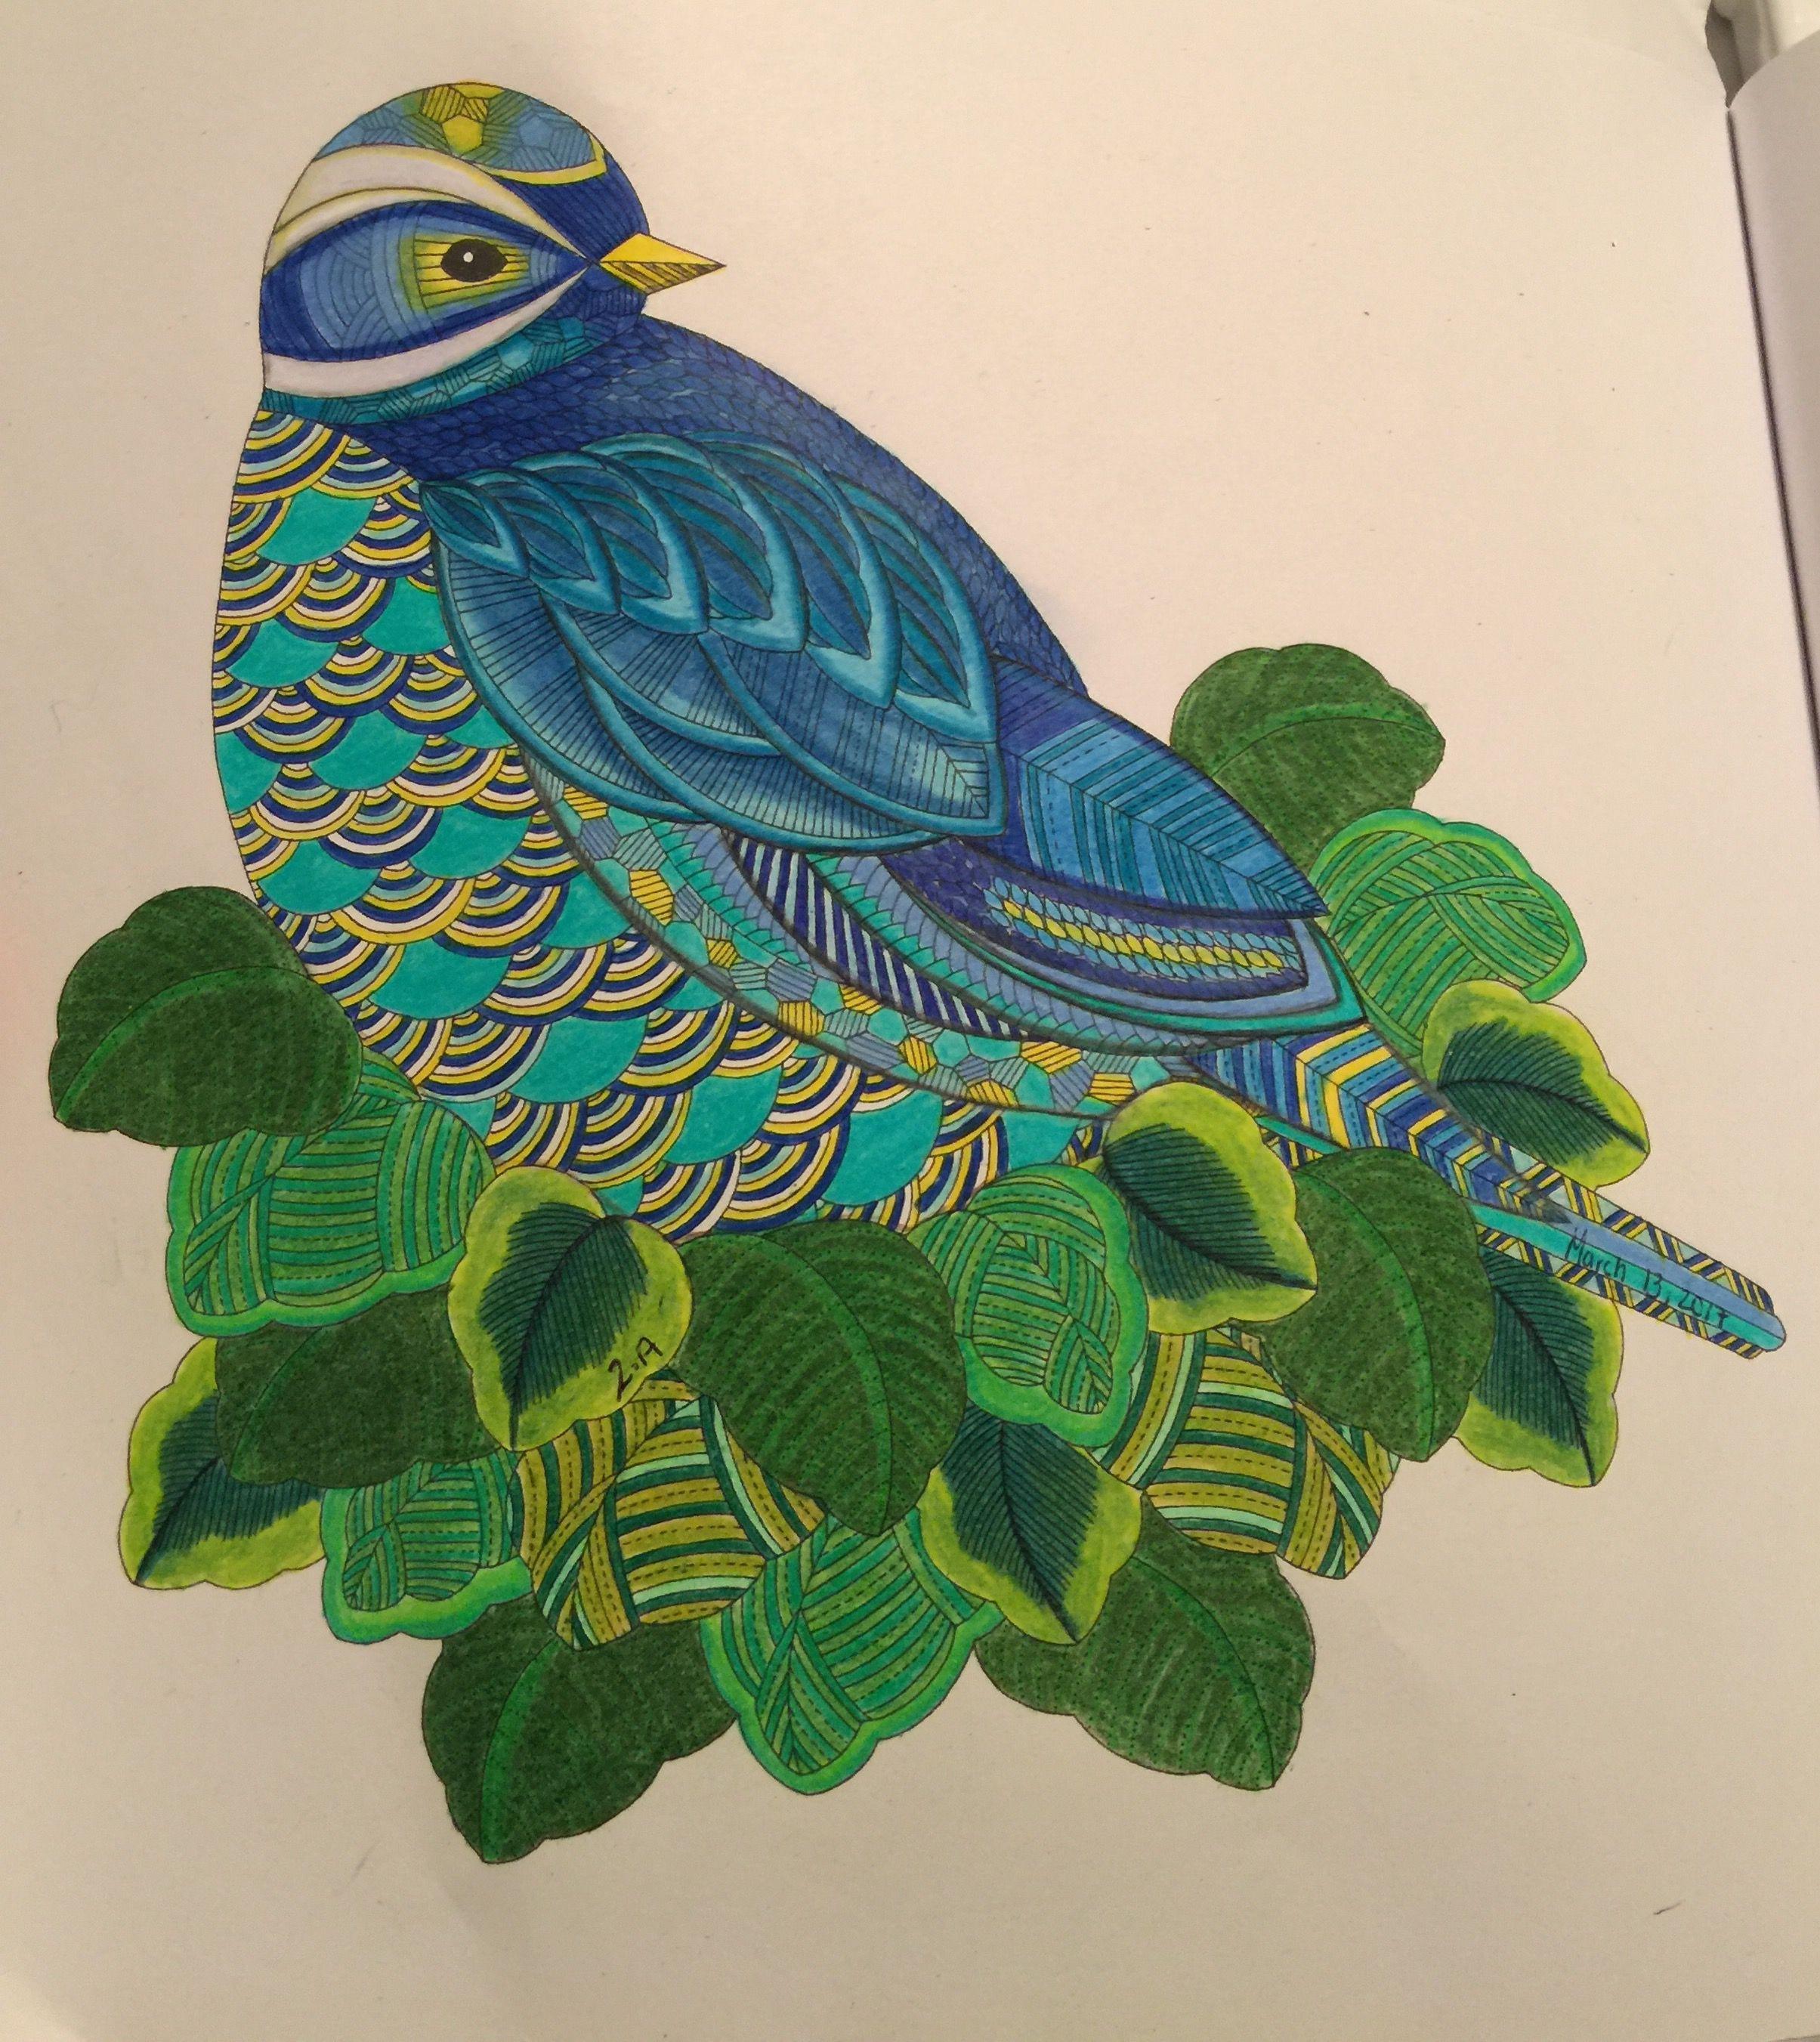 Color me draw me animal kingdom book - Animal Kingdom Millie Marotta Birds Color Me Draw Bird Coloring Book